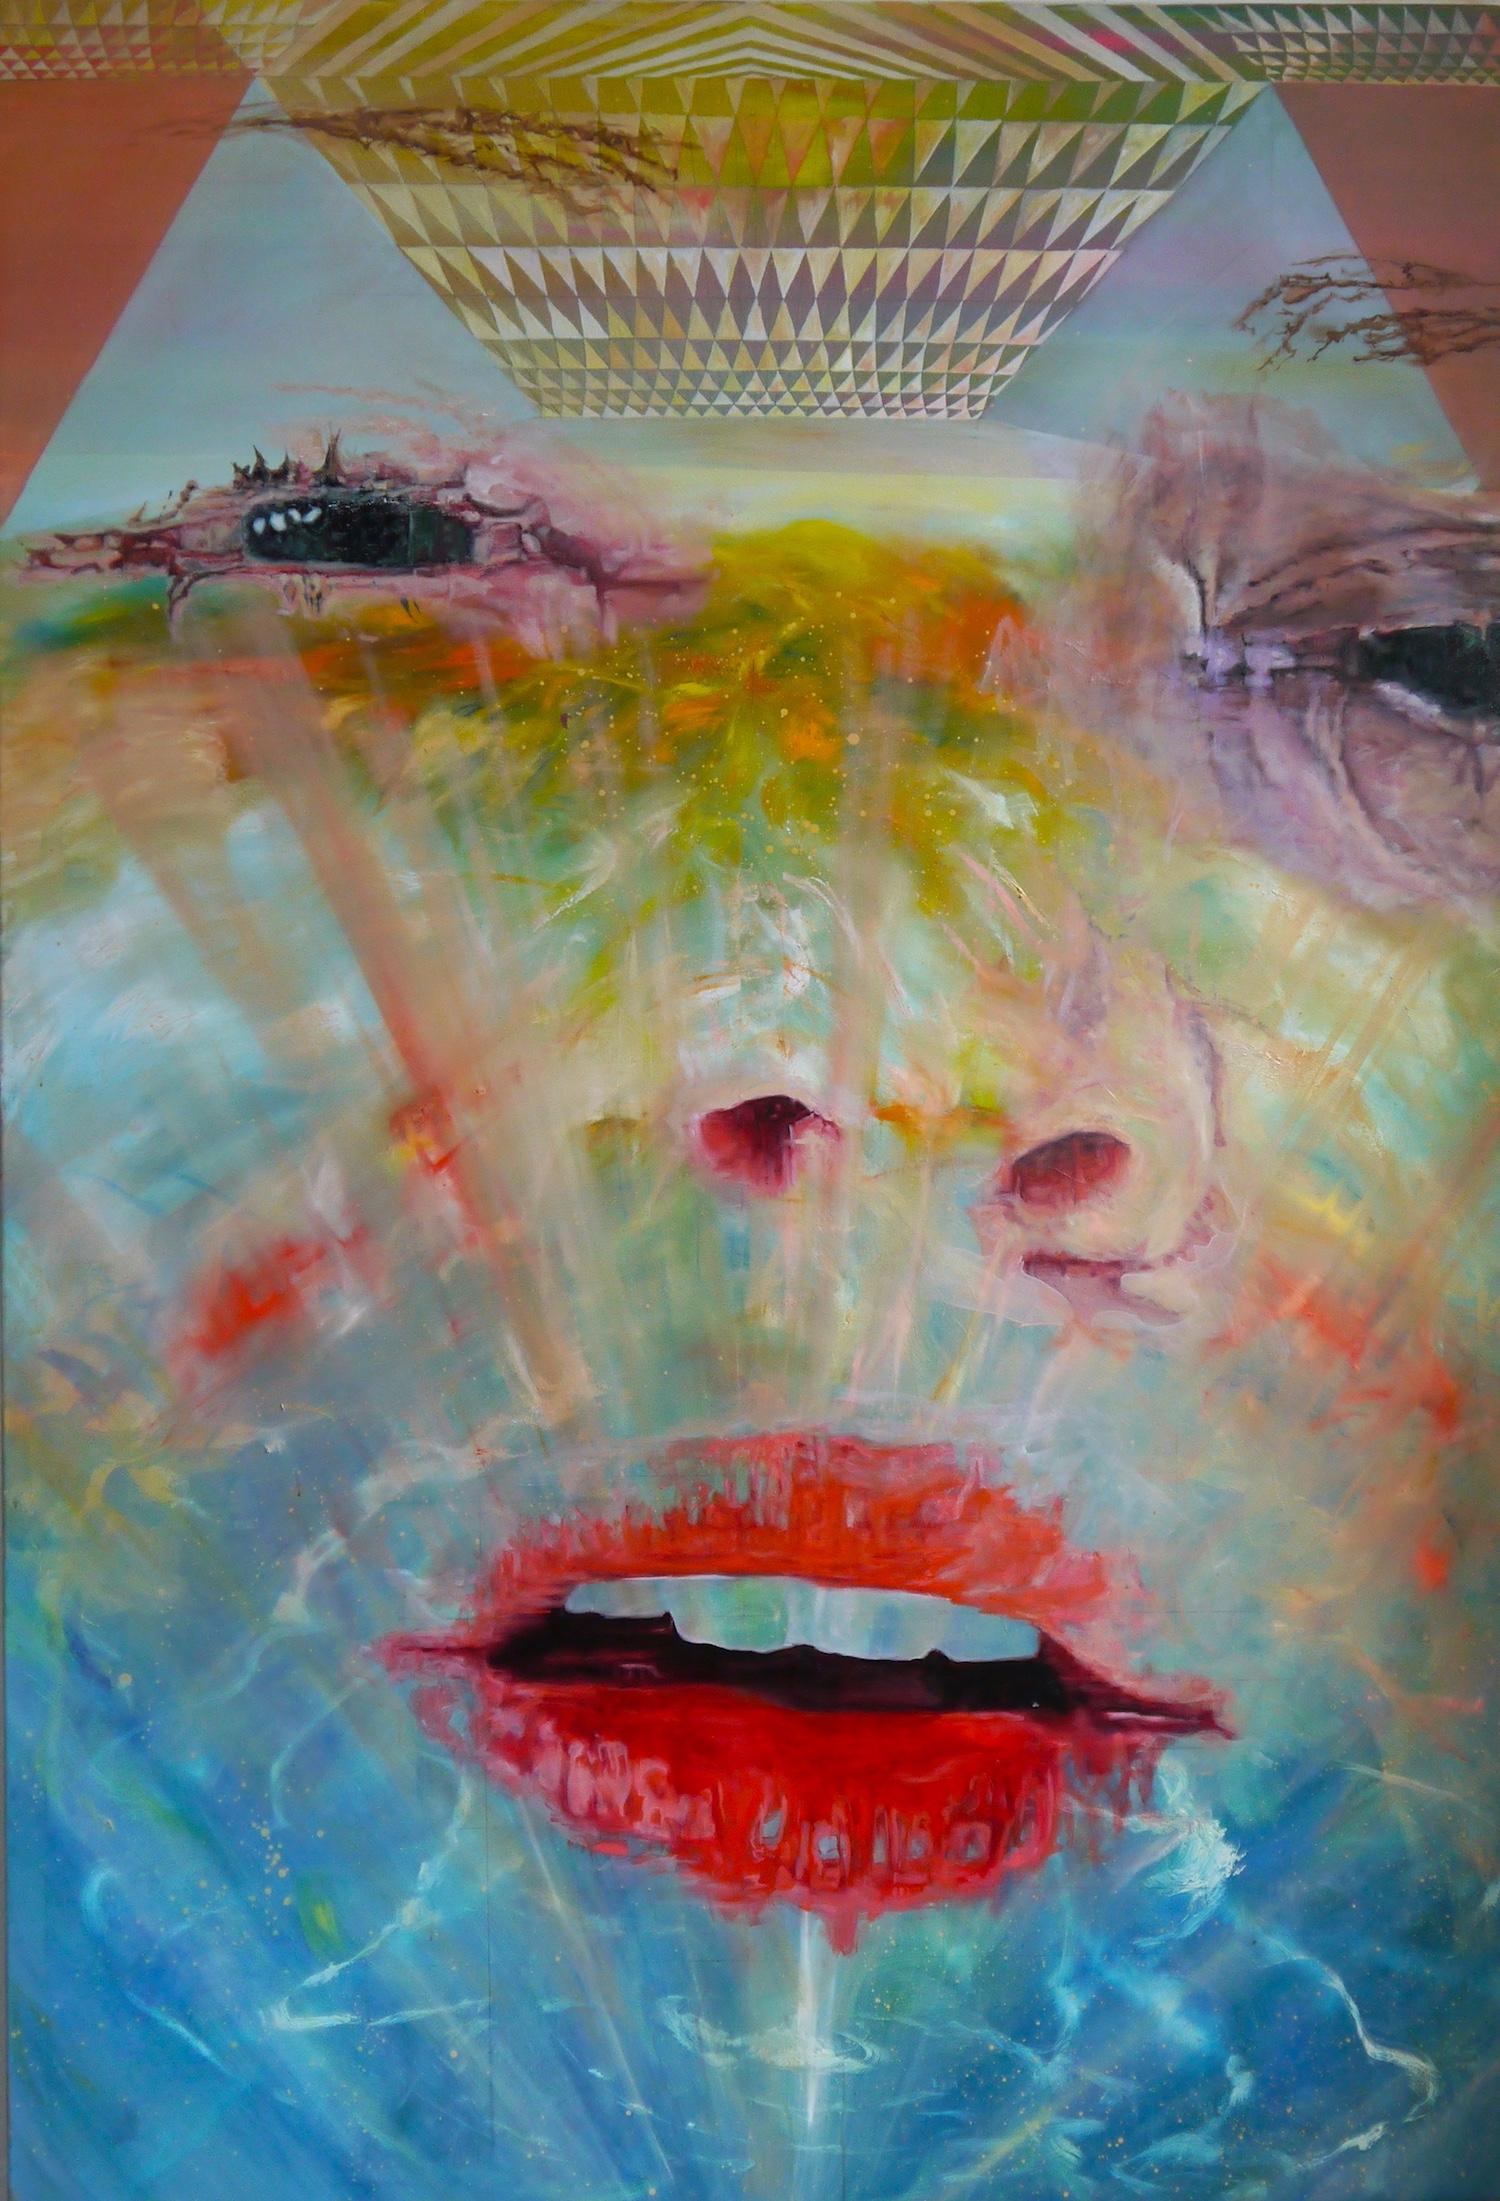 art hyperrealism lie around kunst malerei drift float treiben fliegen fly girl bed thinking bett love you